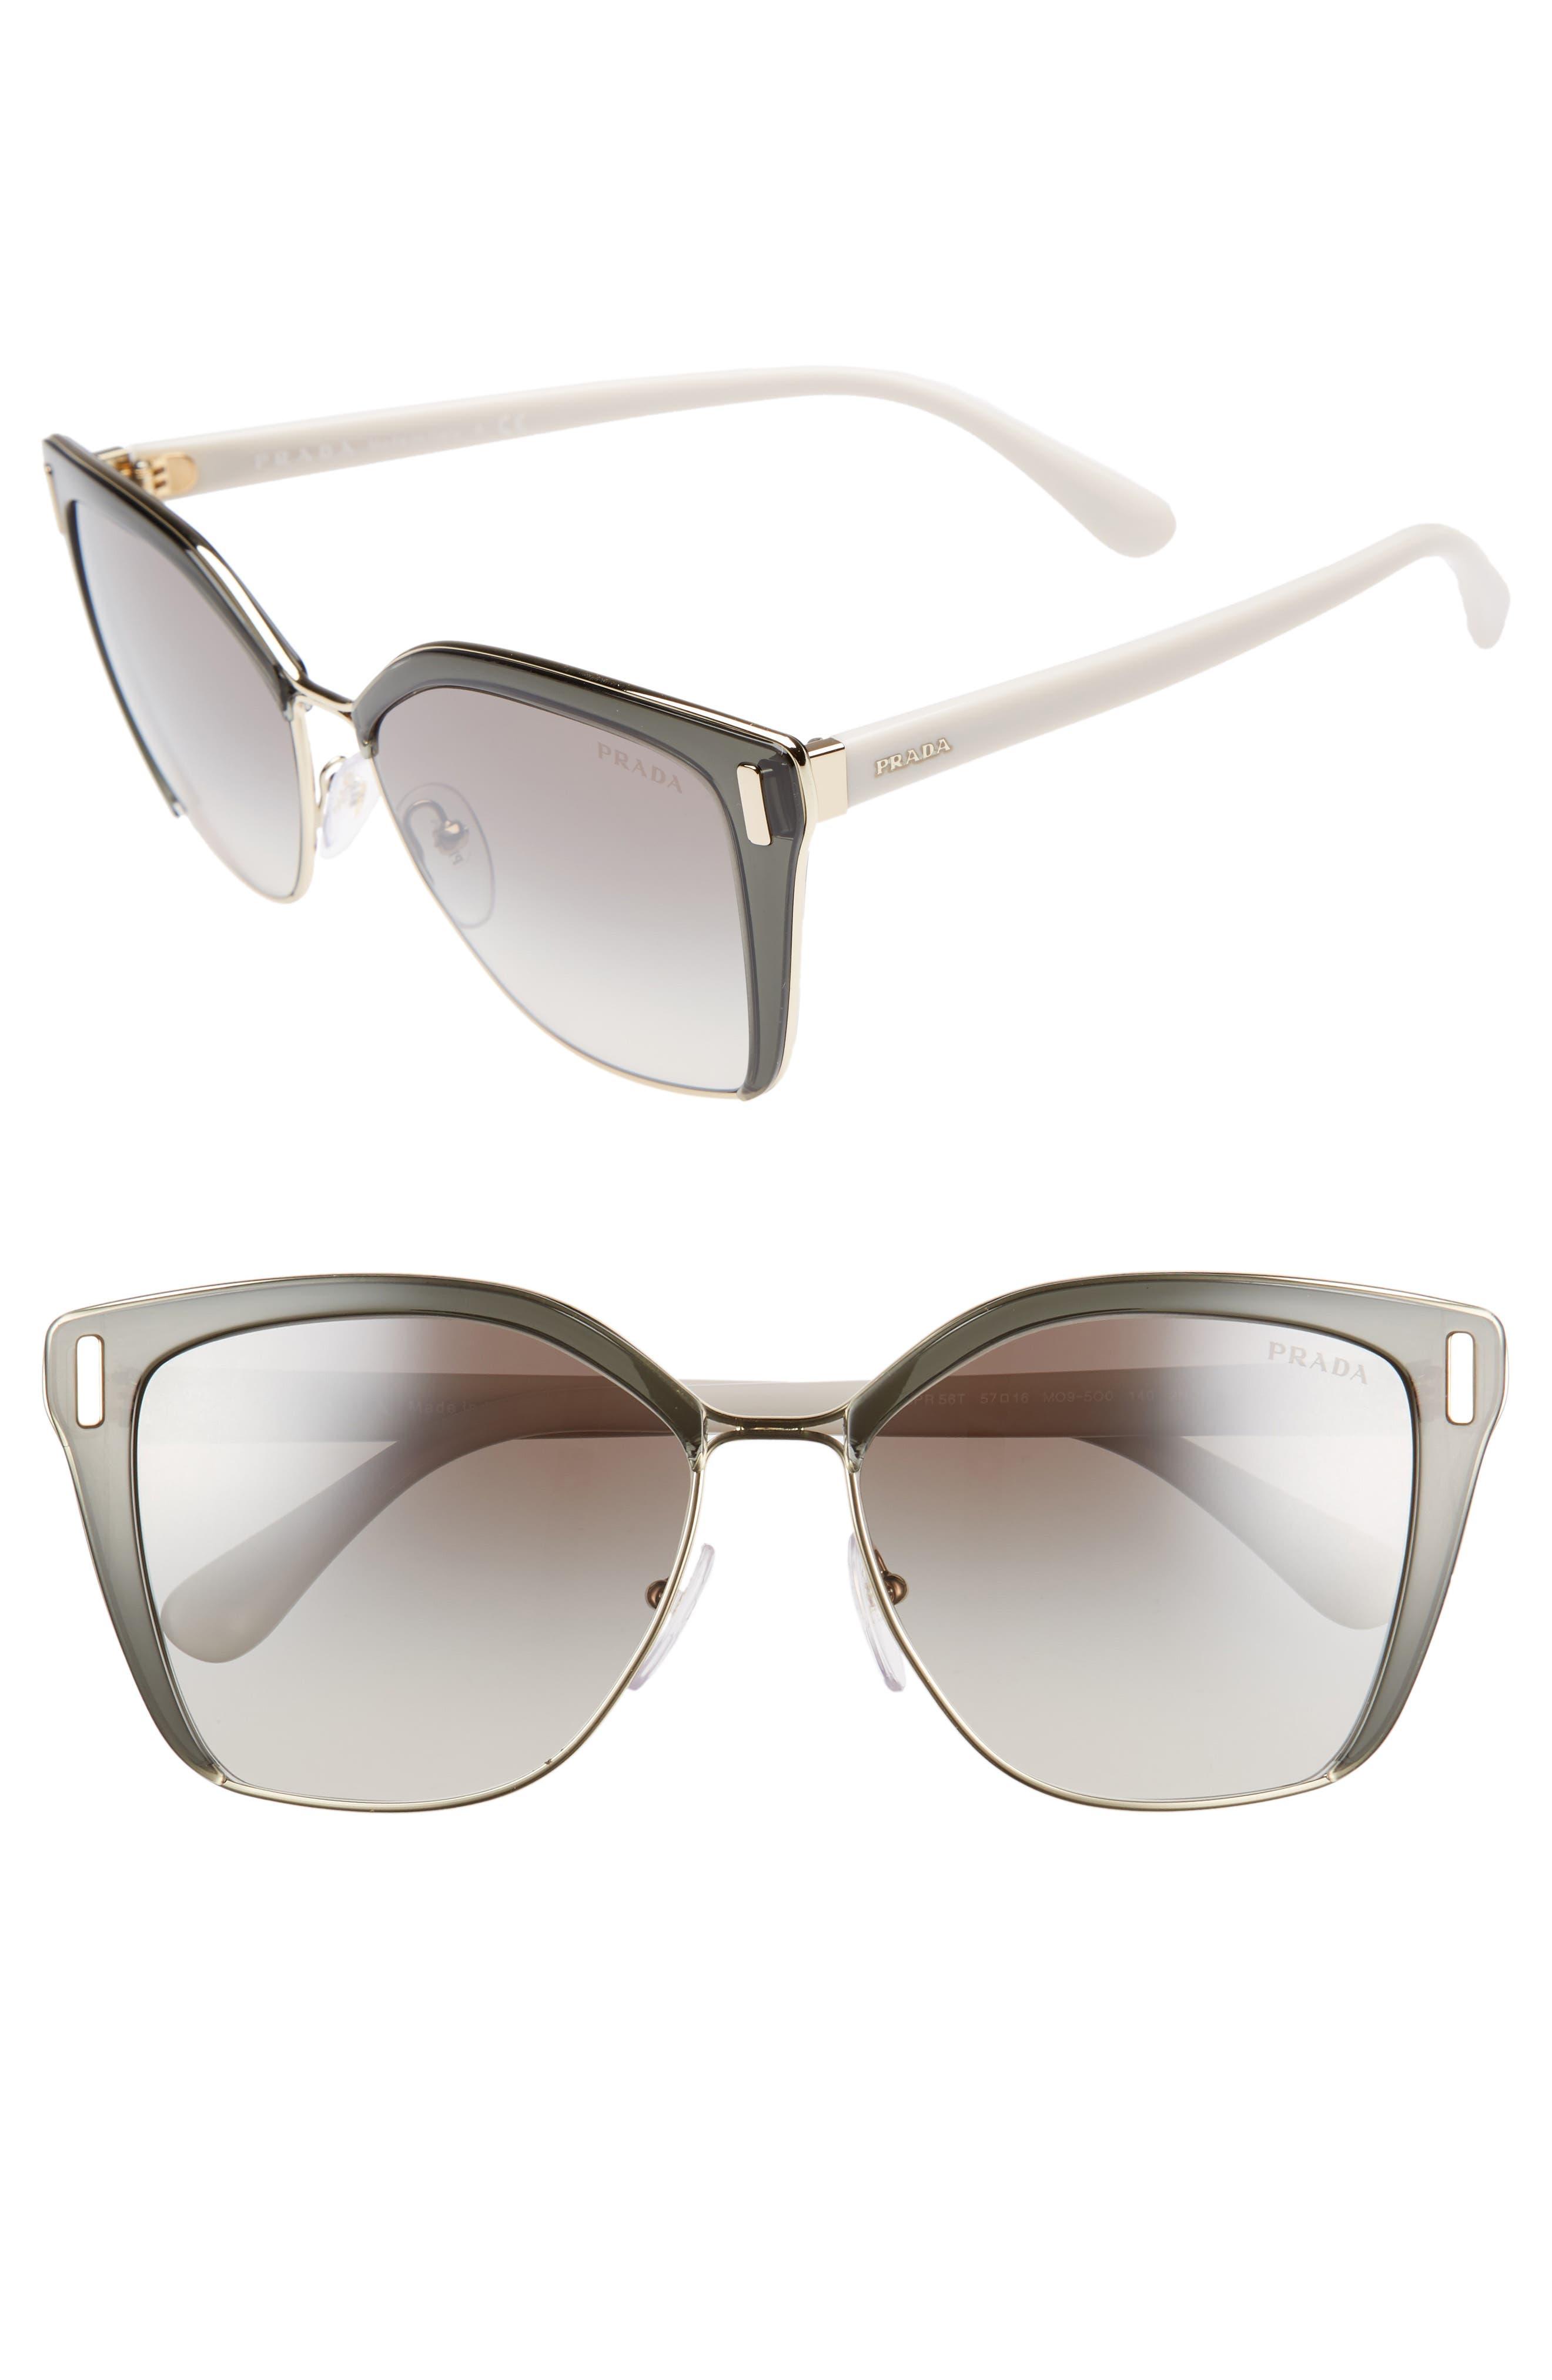 54mm Gradient Geometric Sunglasses,                             Main thumbnail 1, color,                             GREY/ GOLD GRADIENT MIRROR